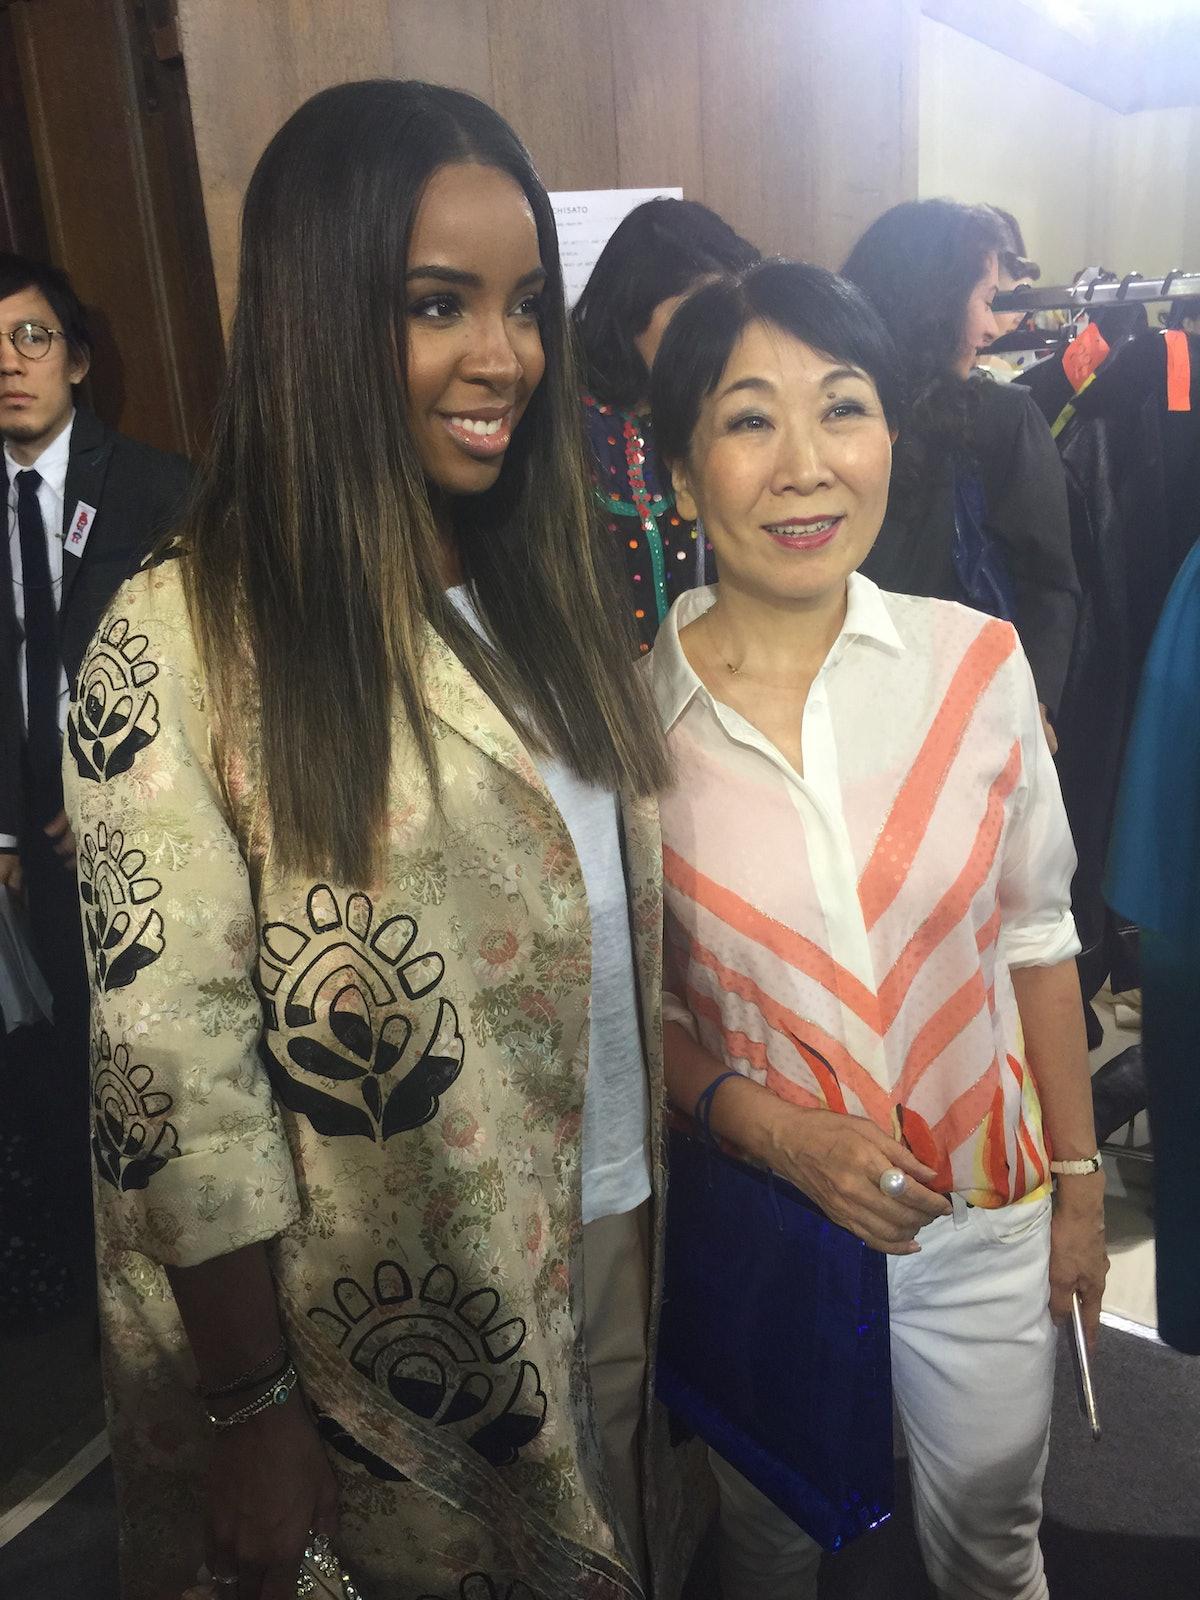 Kelly Rowland and Tsumori Chisato